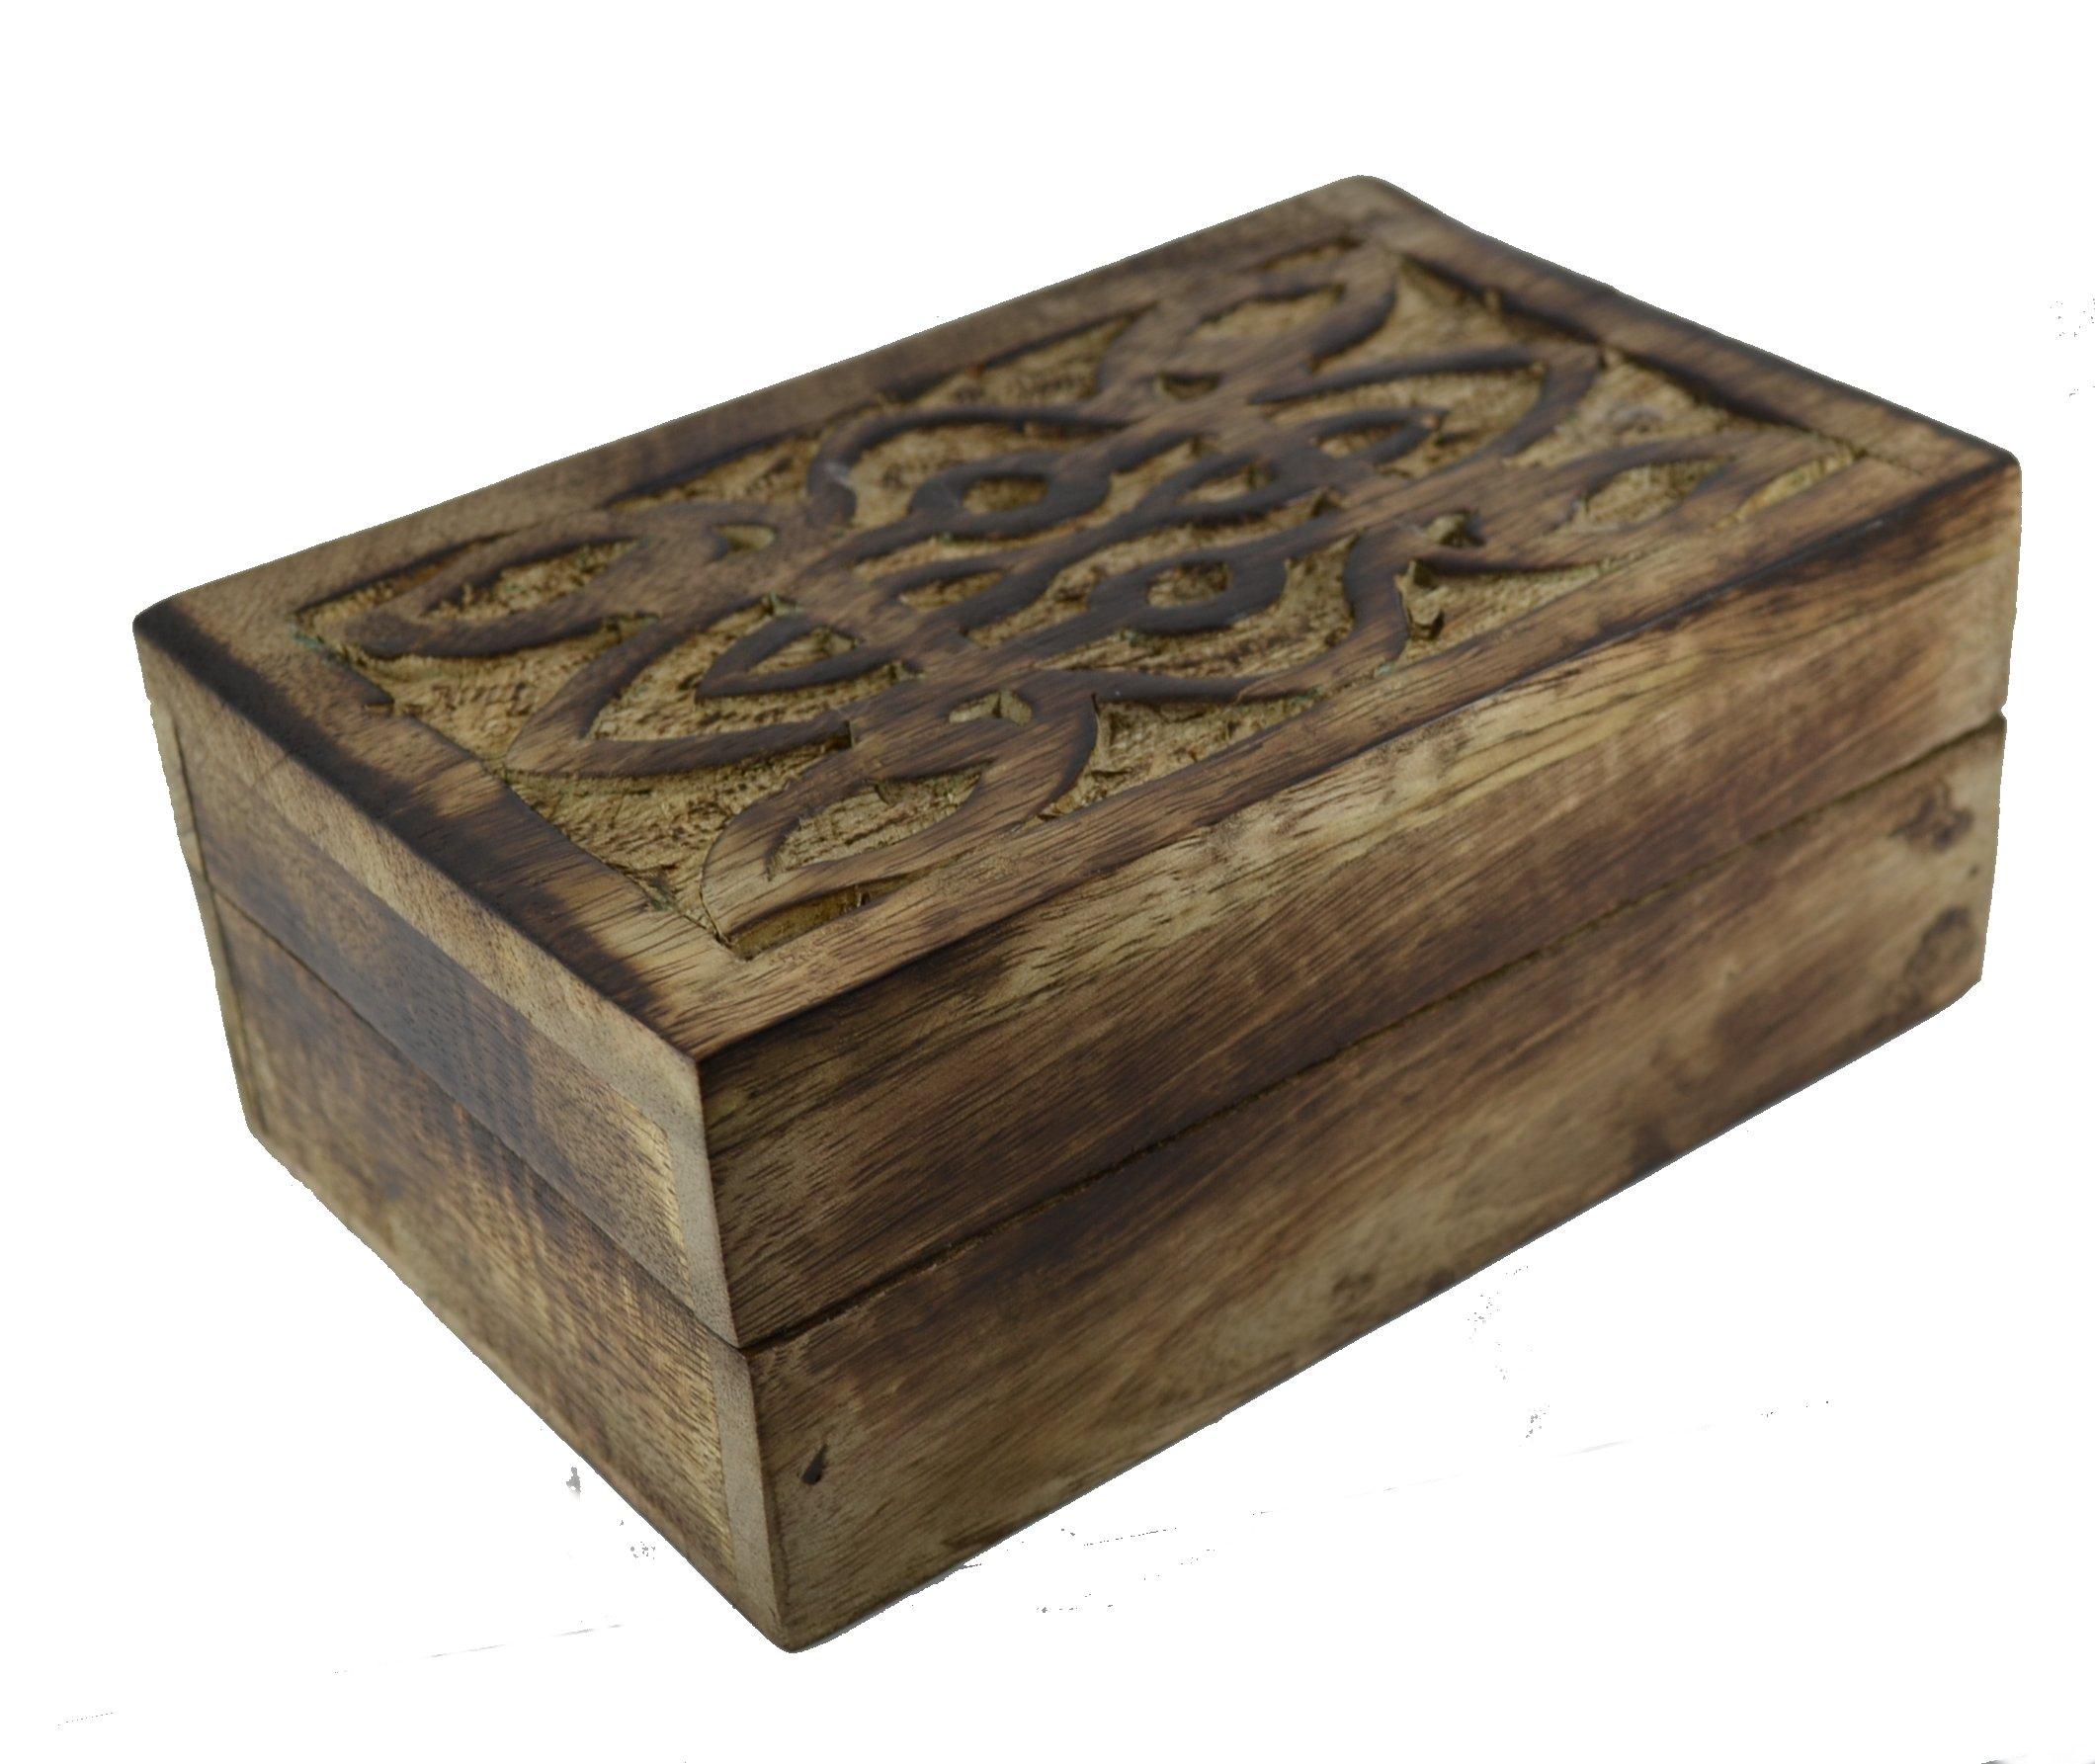 Decorative Recipe Box 2: Mango Wood Tarot Card Box Decorative Celtic Lattice Lid